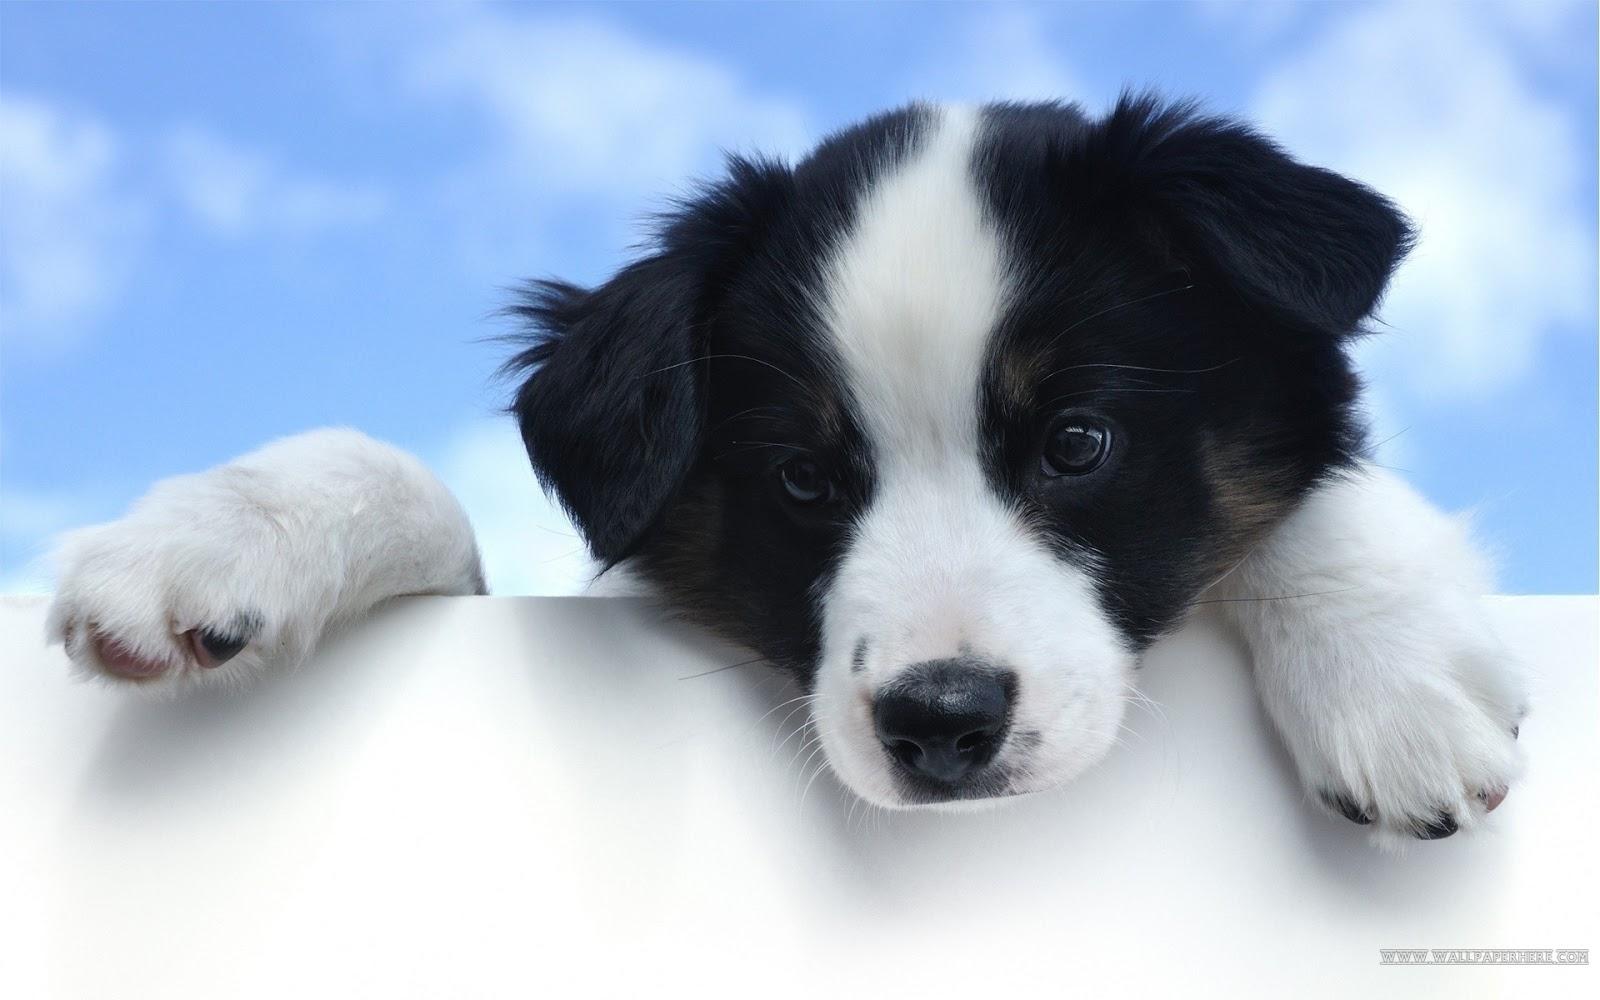 puppies wallpaper hd 235 - photo #6